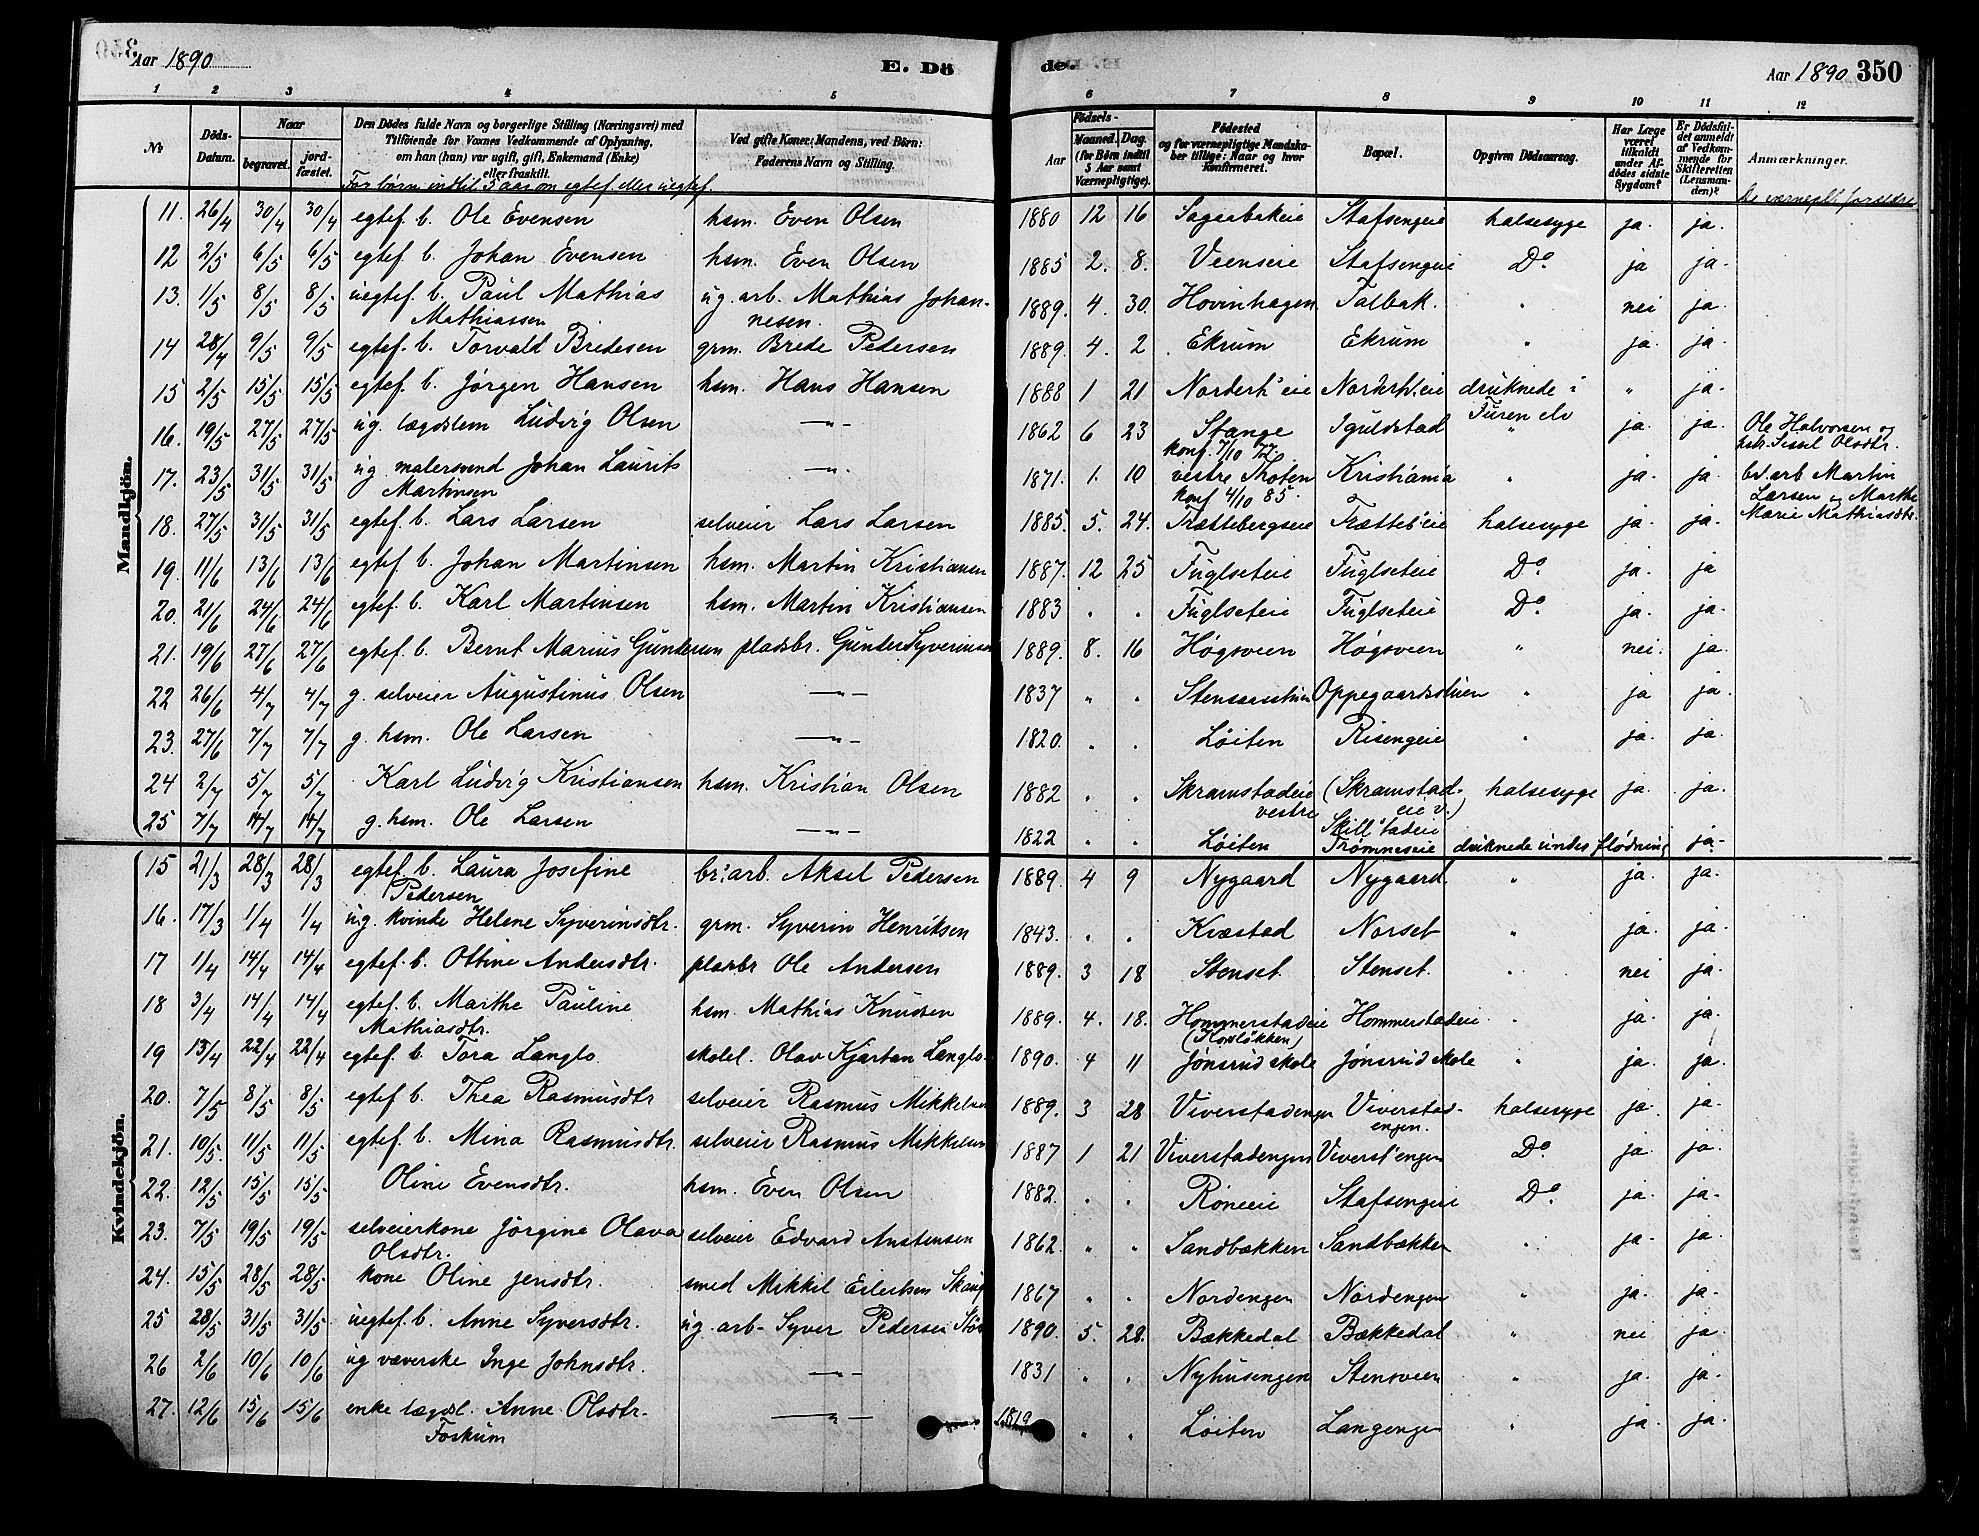 SAH, Løten prestekontor, K/Ka/L0009: Ministerialbok nr. 9, 1878-1891, s. 350